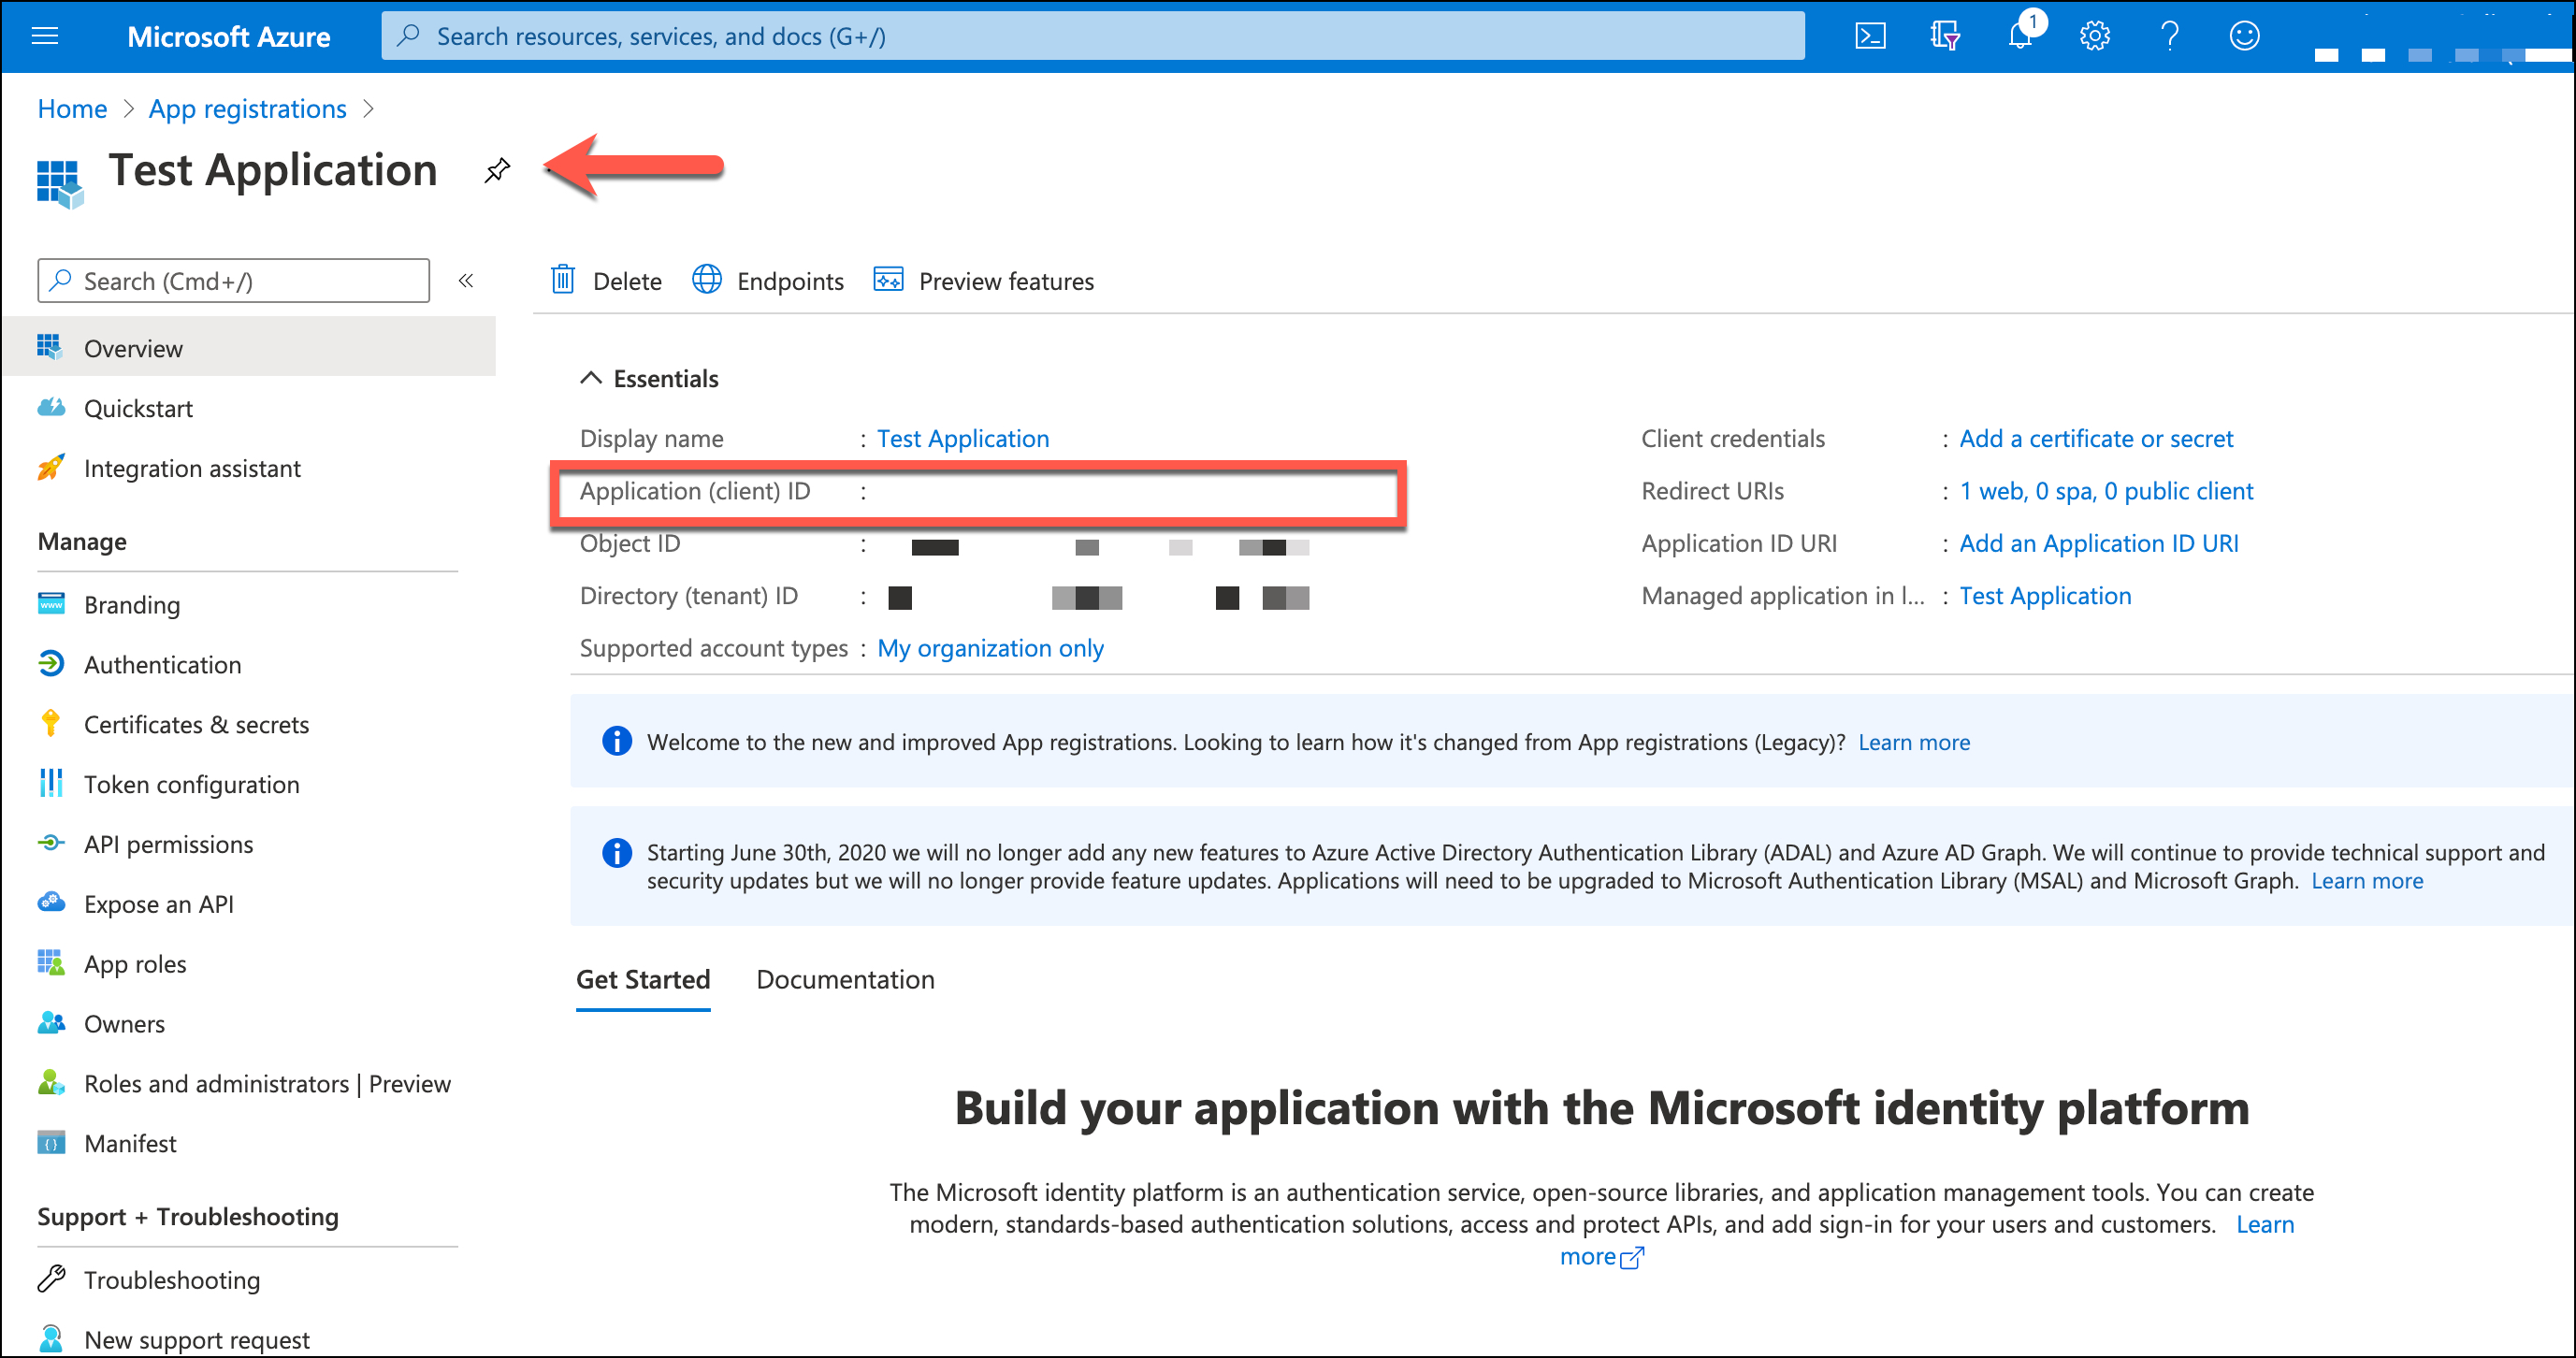 Azure Creating an Application - Application ID